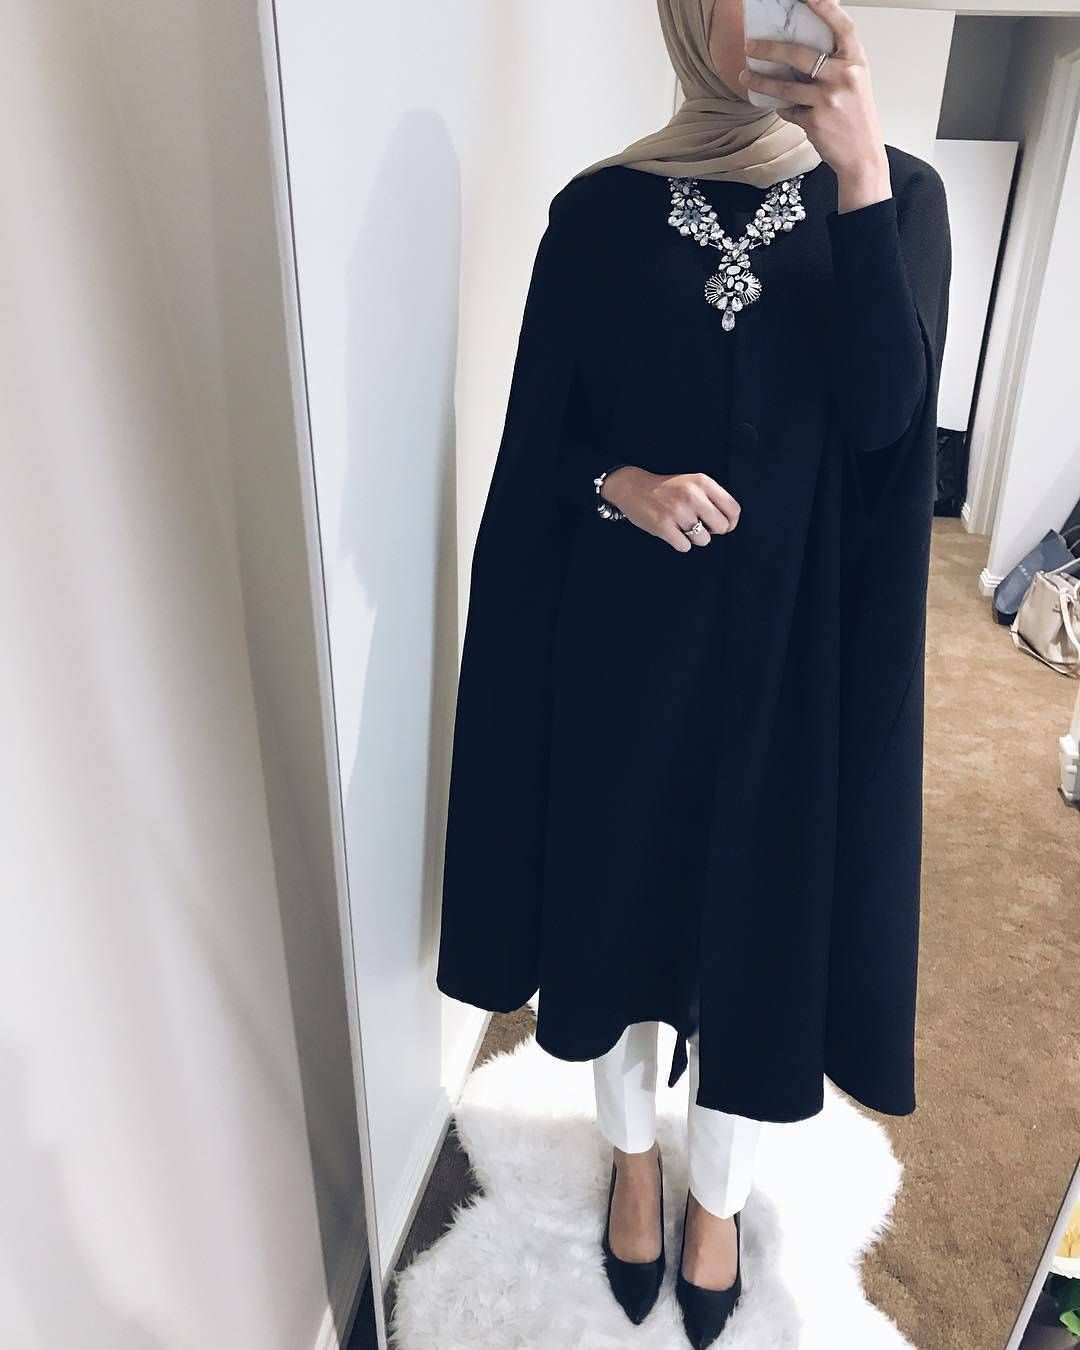 Fabuleux 8,025 Likes, 30 Comments - Hijab Fashion Inspiration  LG52